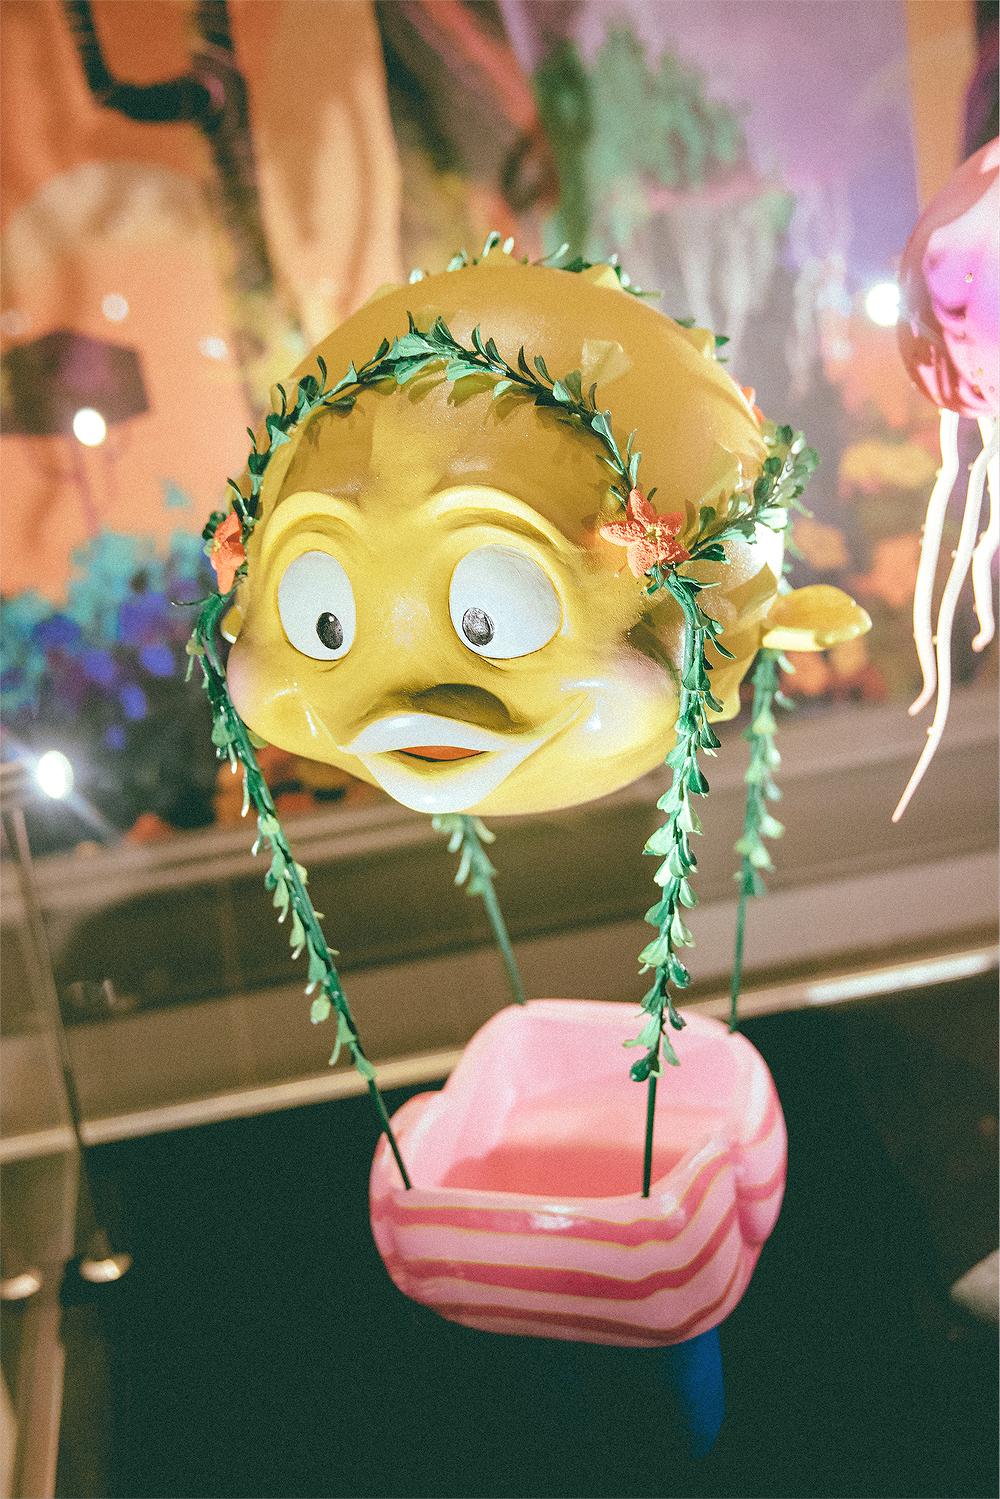 Blowfish Balloon Race from Mermaid Lagoon